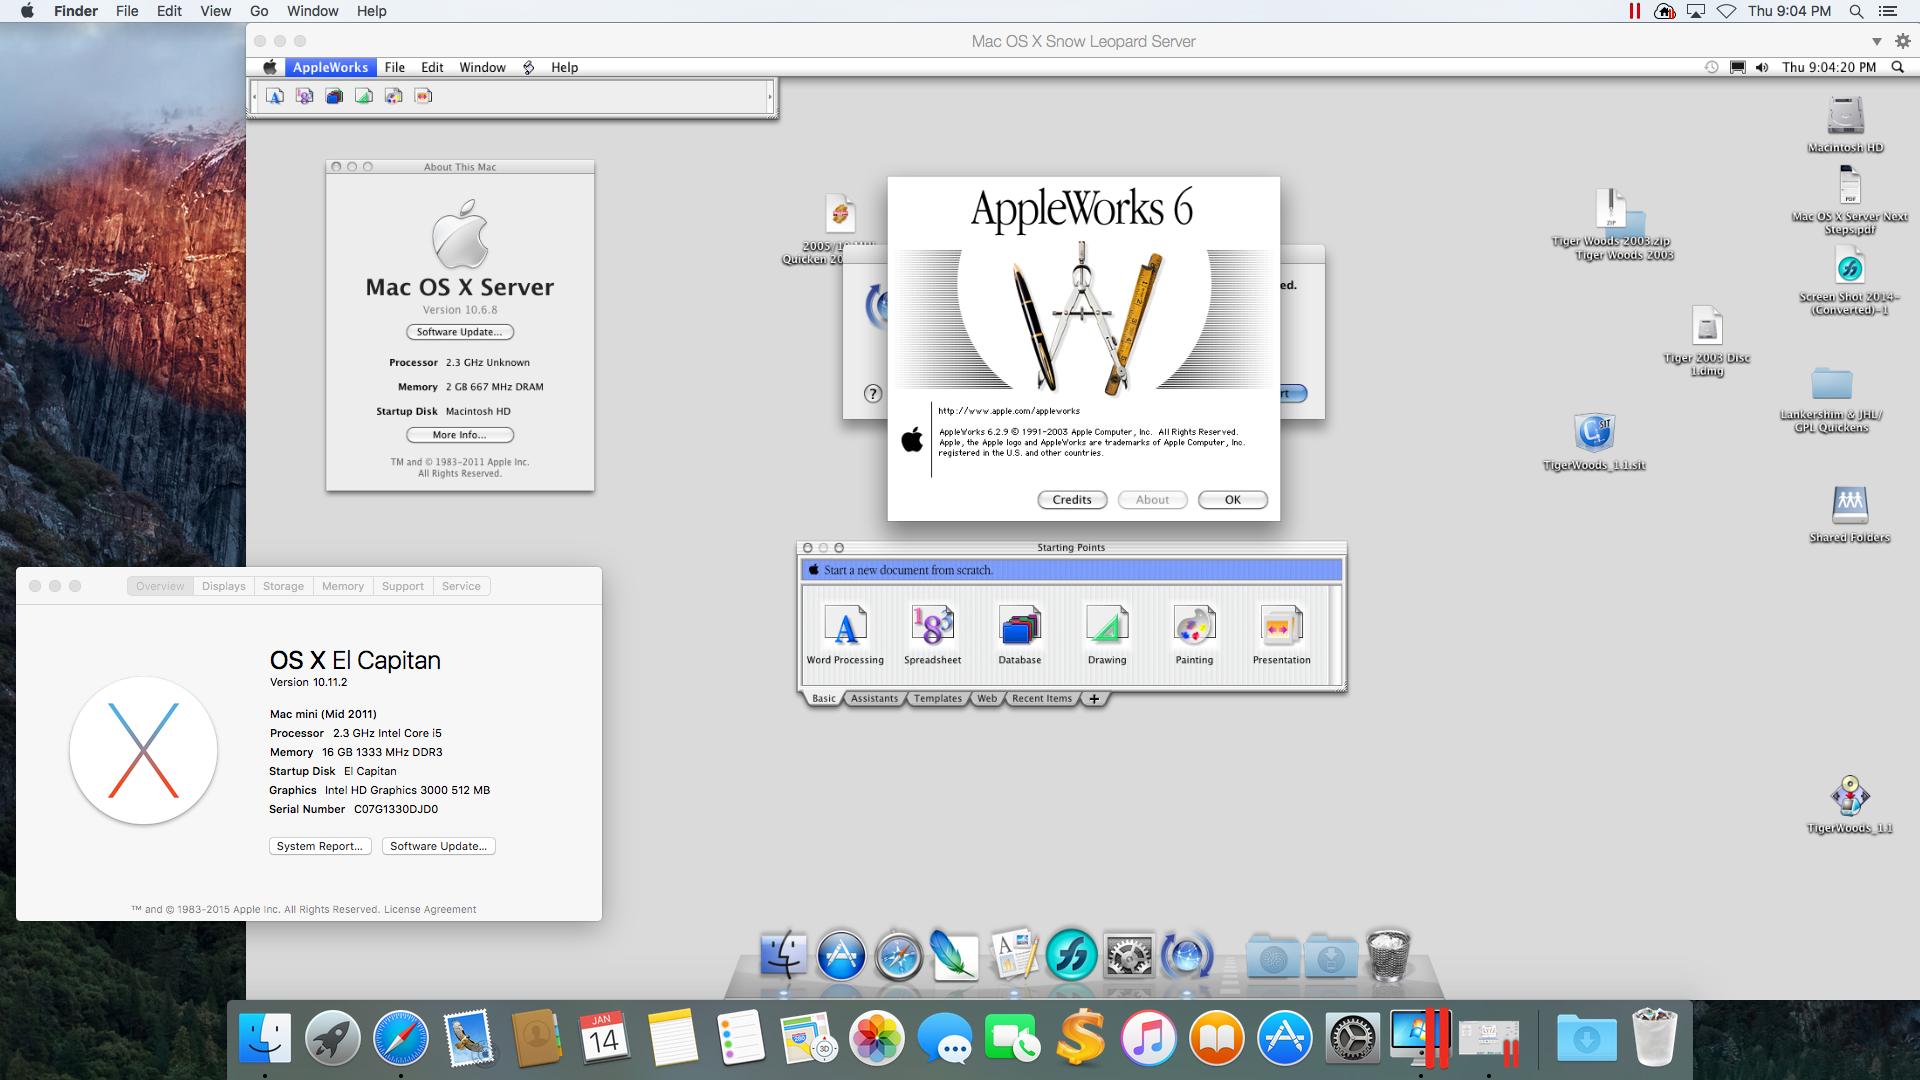 appleworks pour mac